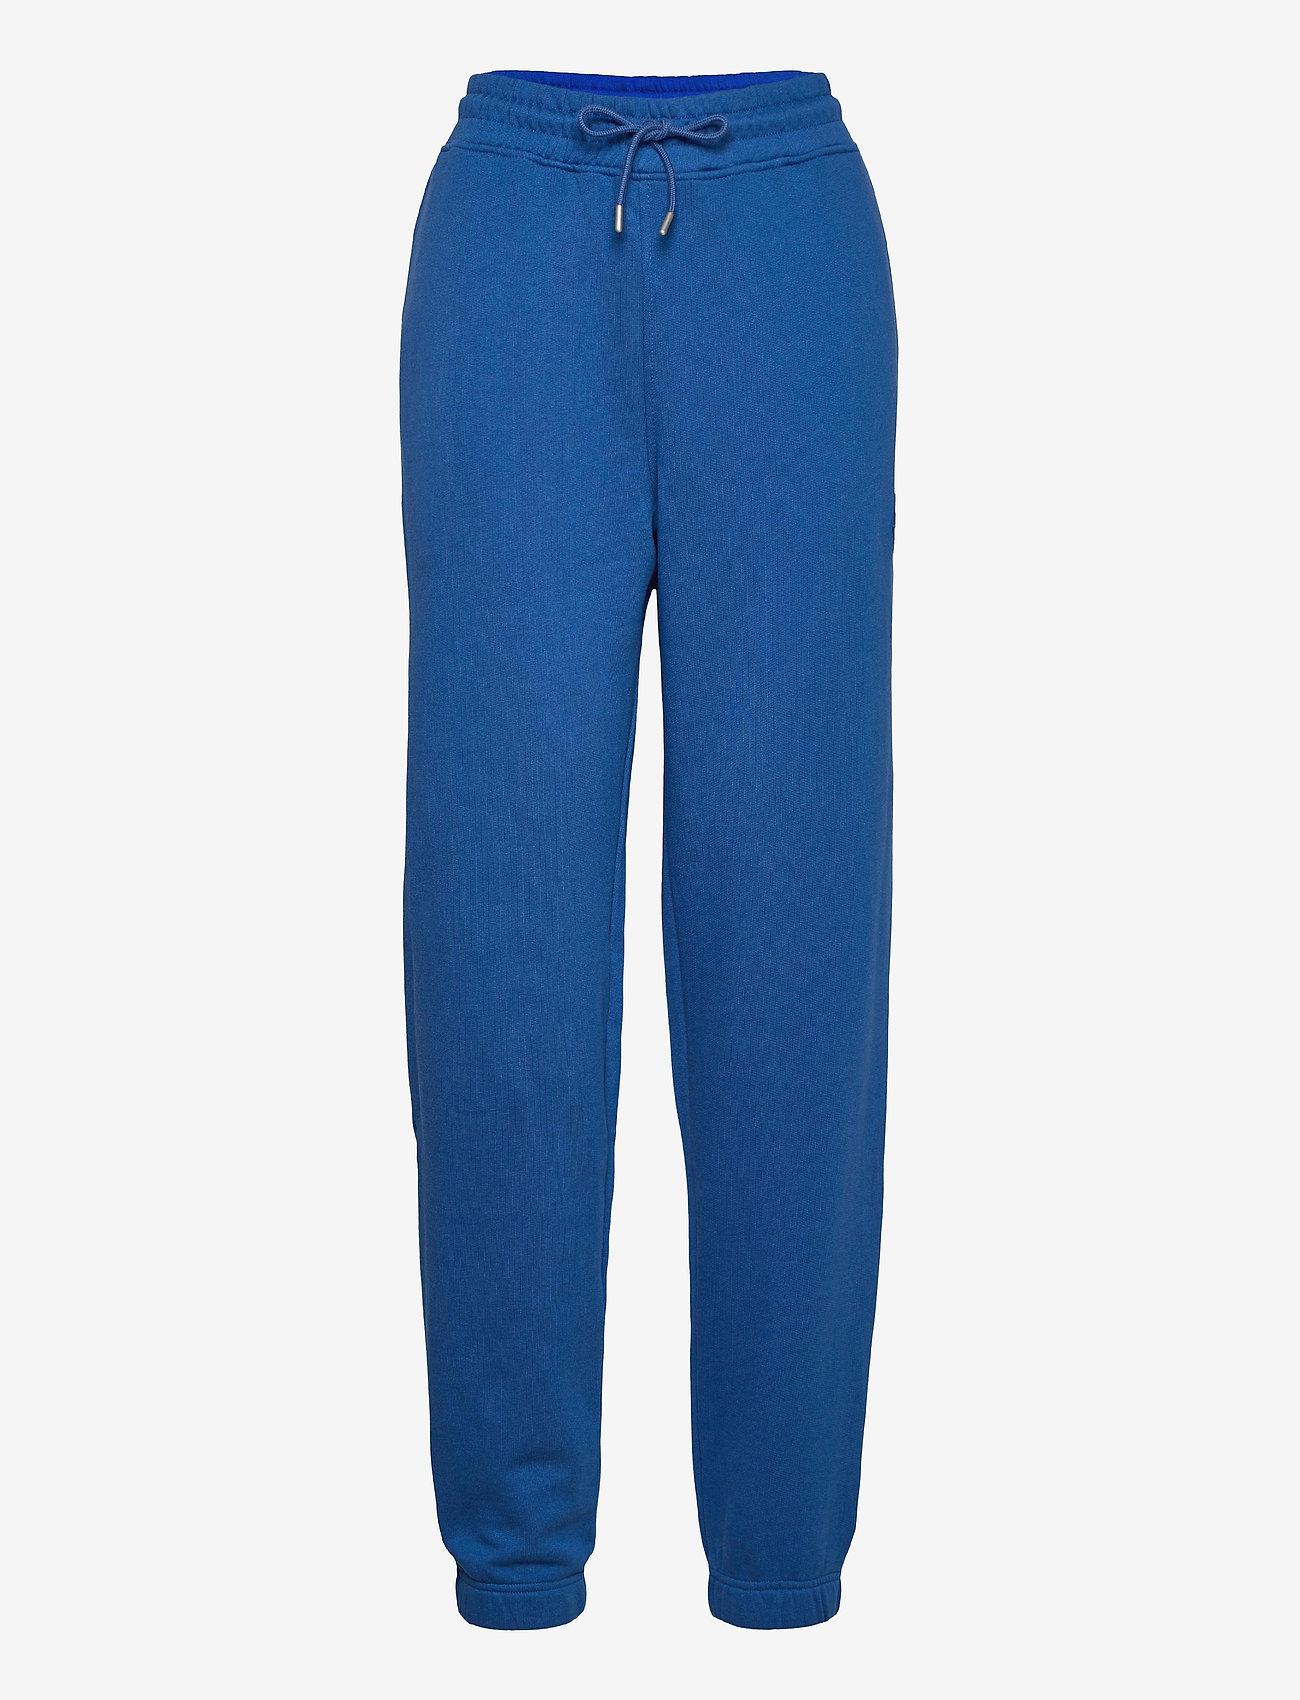 Hanger by Holzweiler - Hanger Trousers - neue mode - blue 4056 - 1